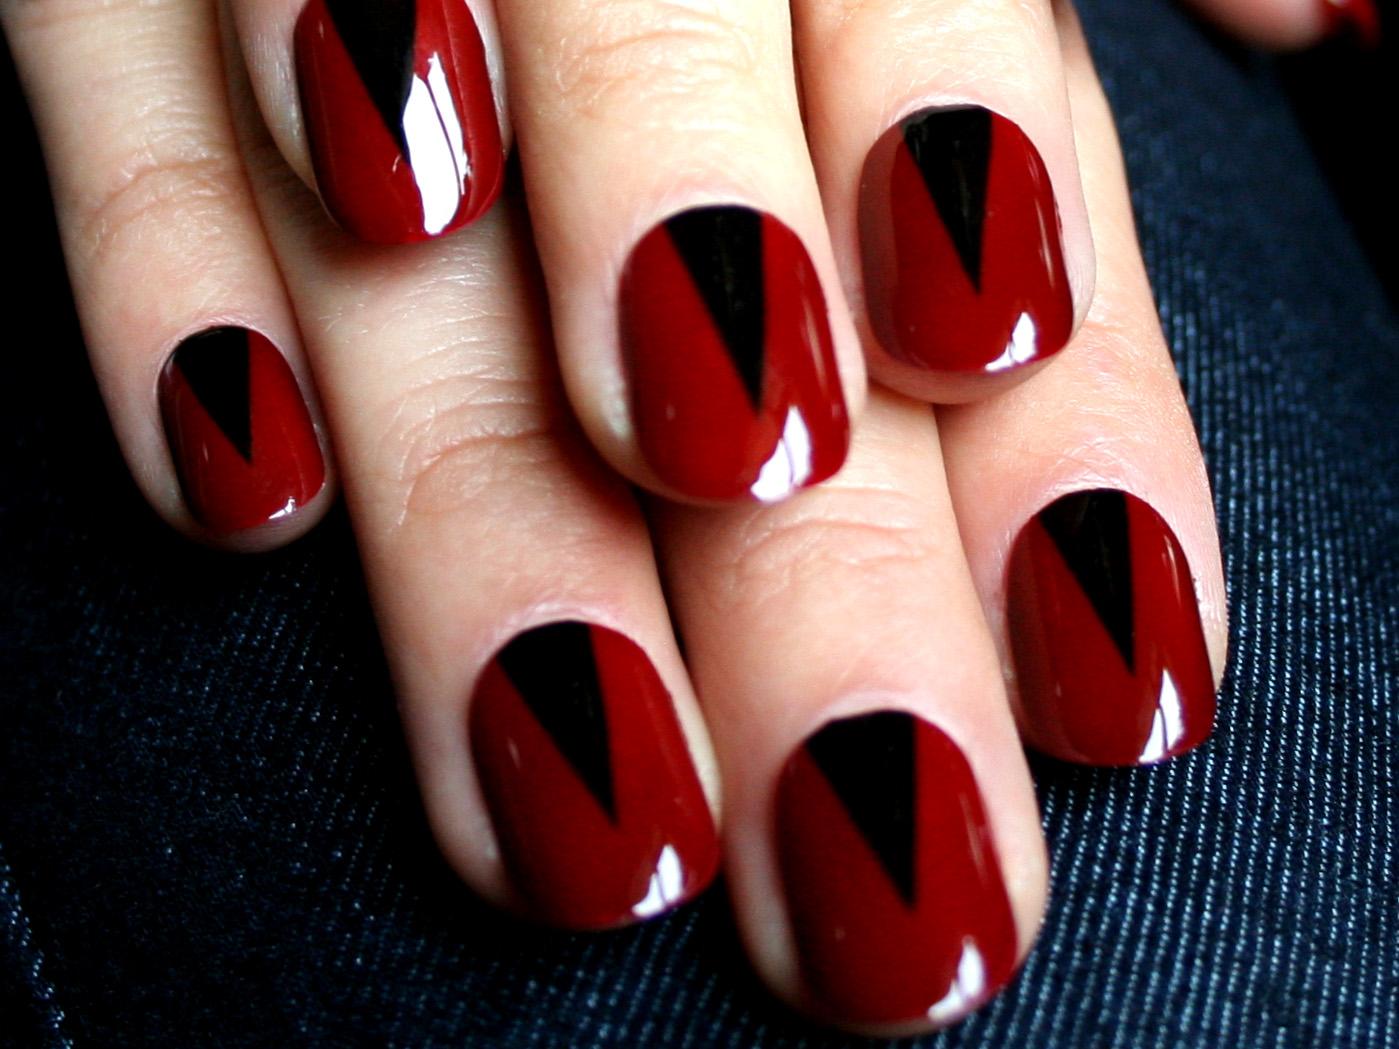 Nail polish freshfood page 2 b4c910944d52dc523db65522f2a5c424 black and red nail art tumblr tumblrng48vfwptv1r5y7tco1500 prinsesfo Choice Image